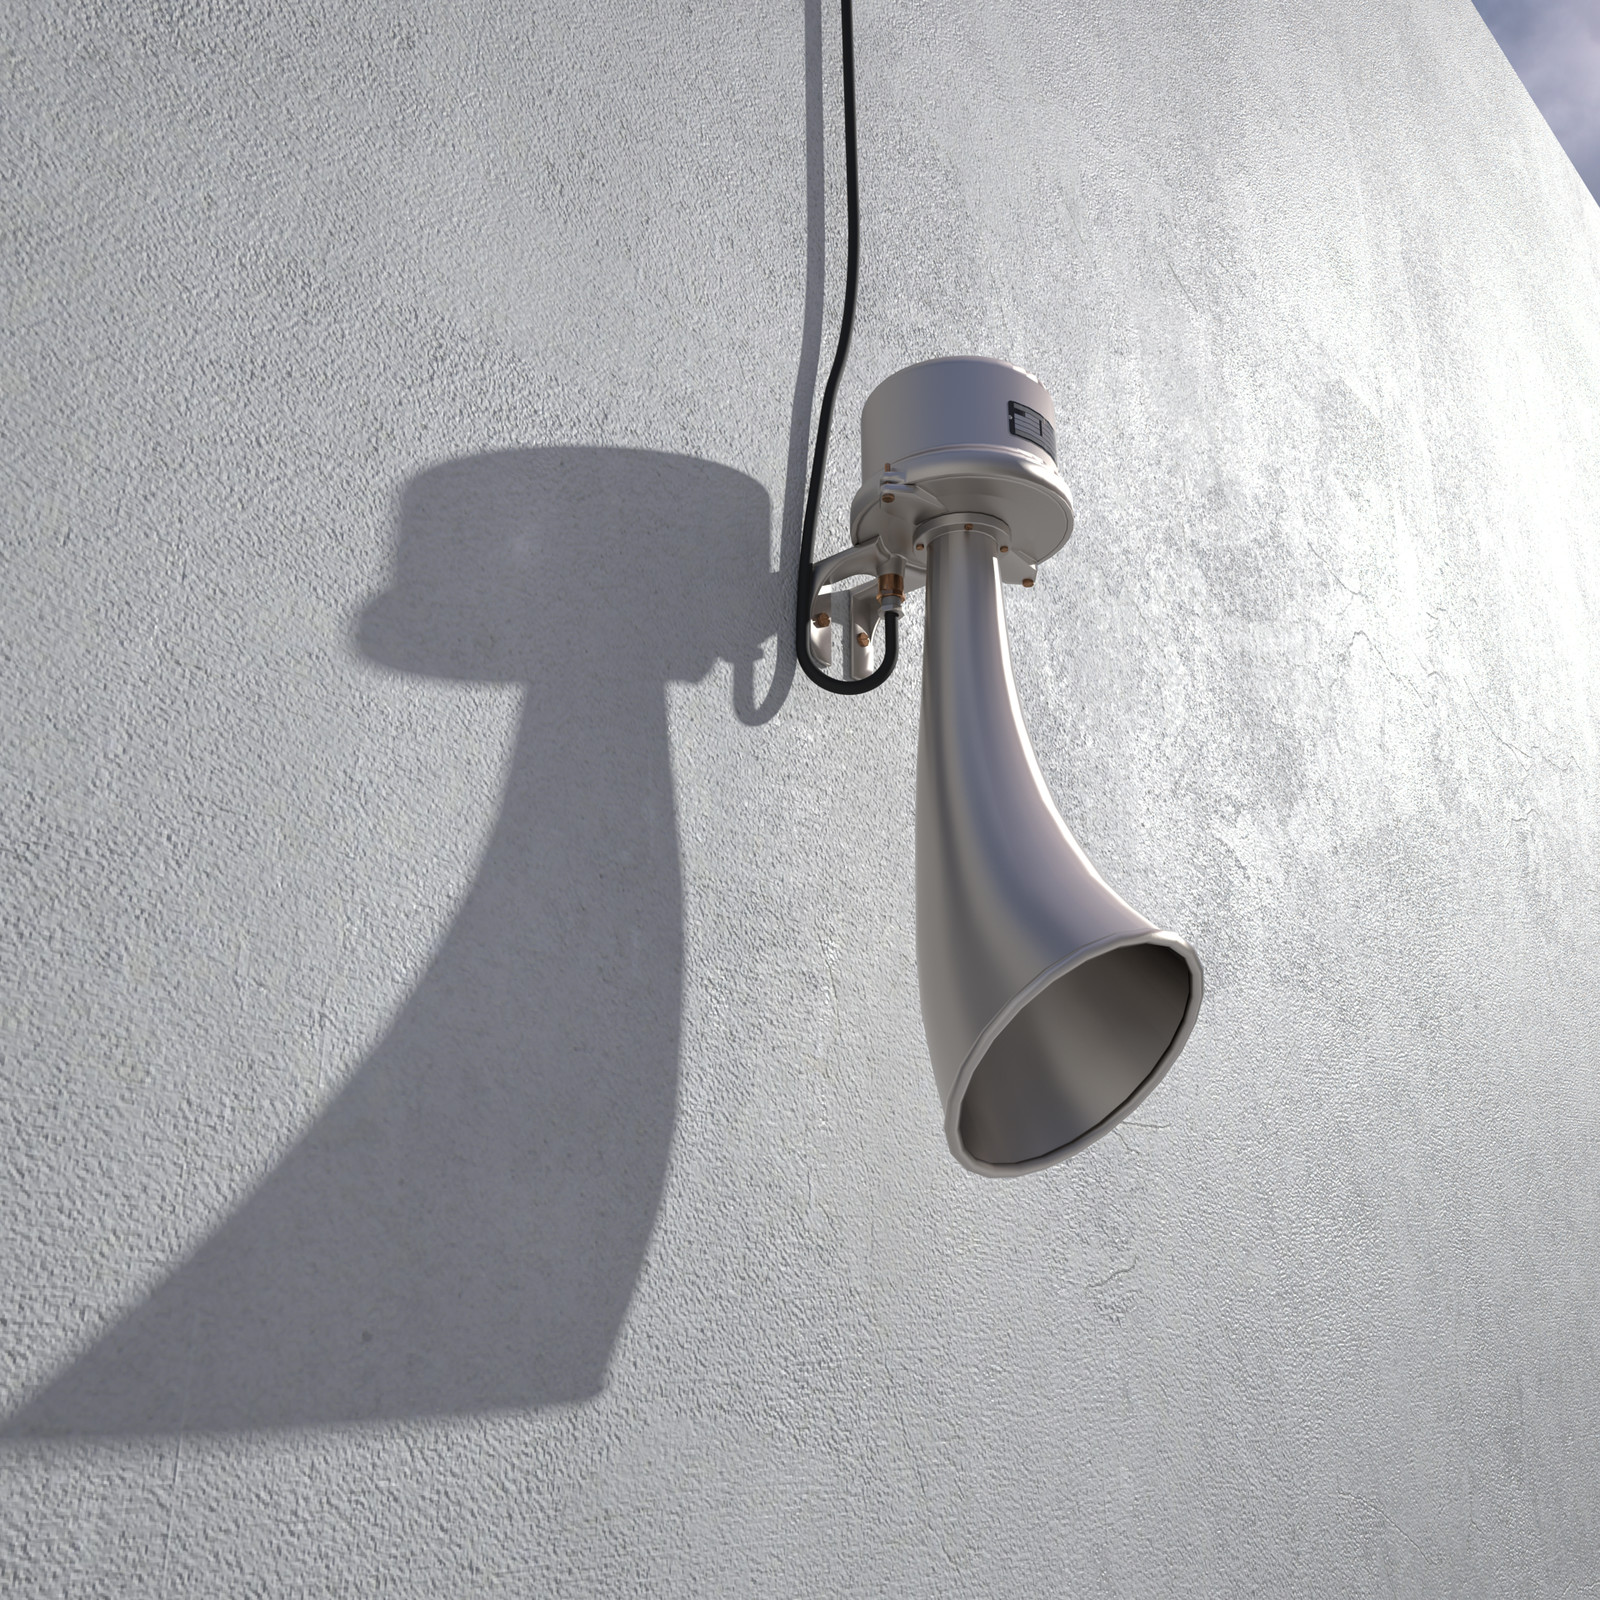 SketchUp  Rivendell Mill's Industrial Signal Warehouse Horn  Rivendell Horns 01 Final Scene 07